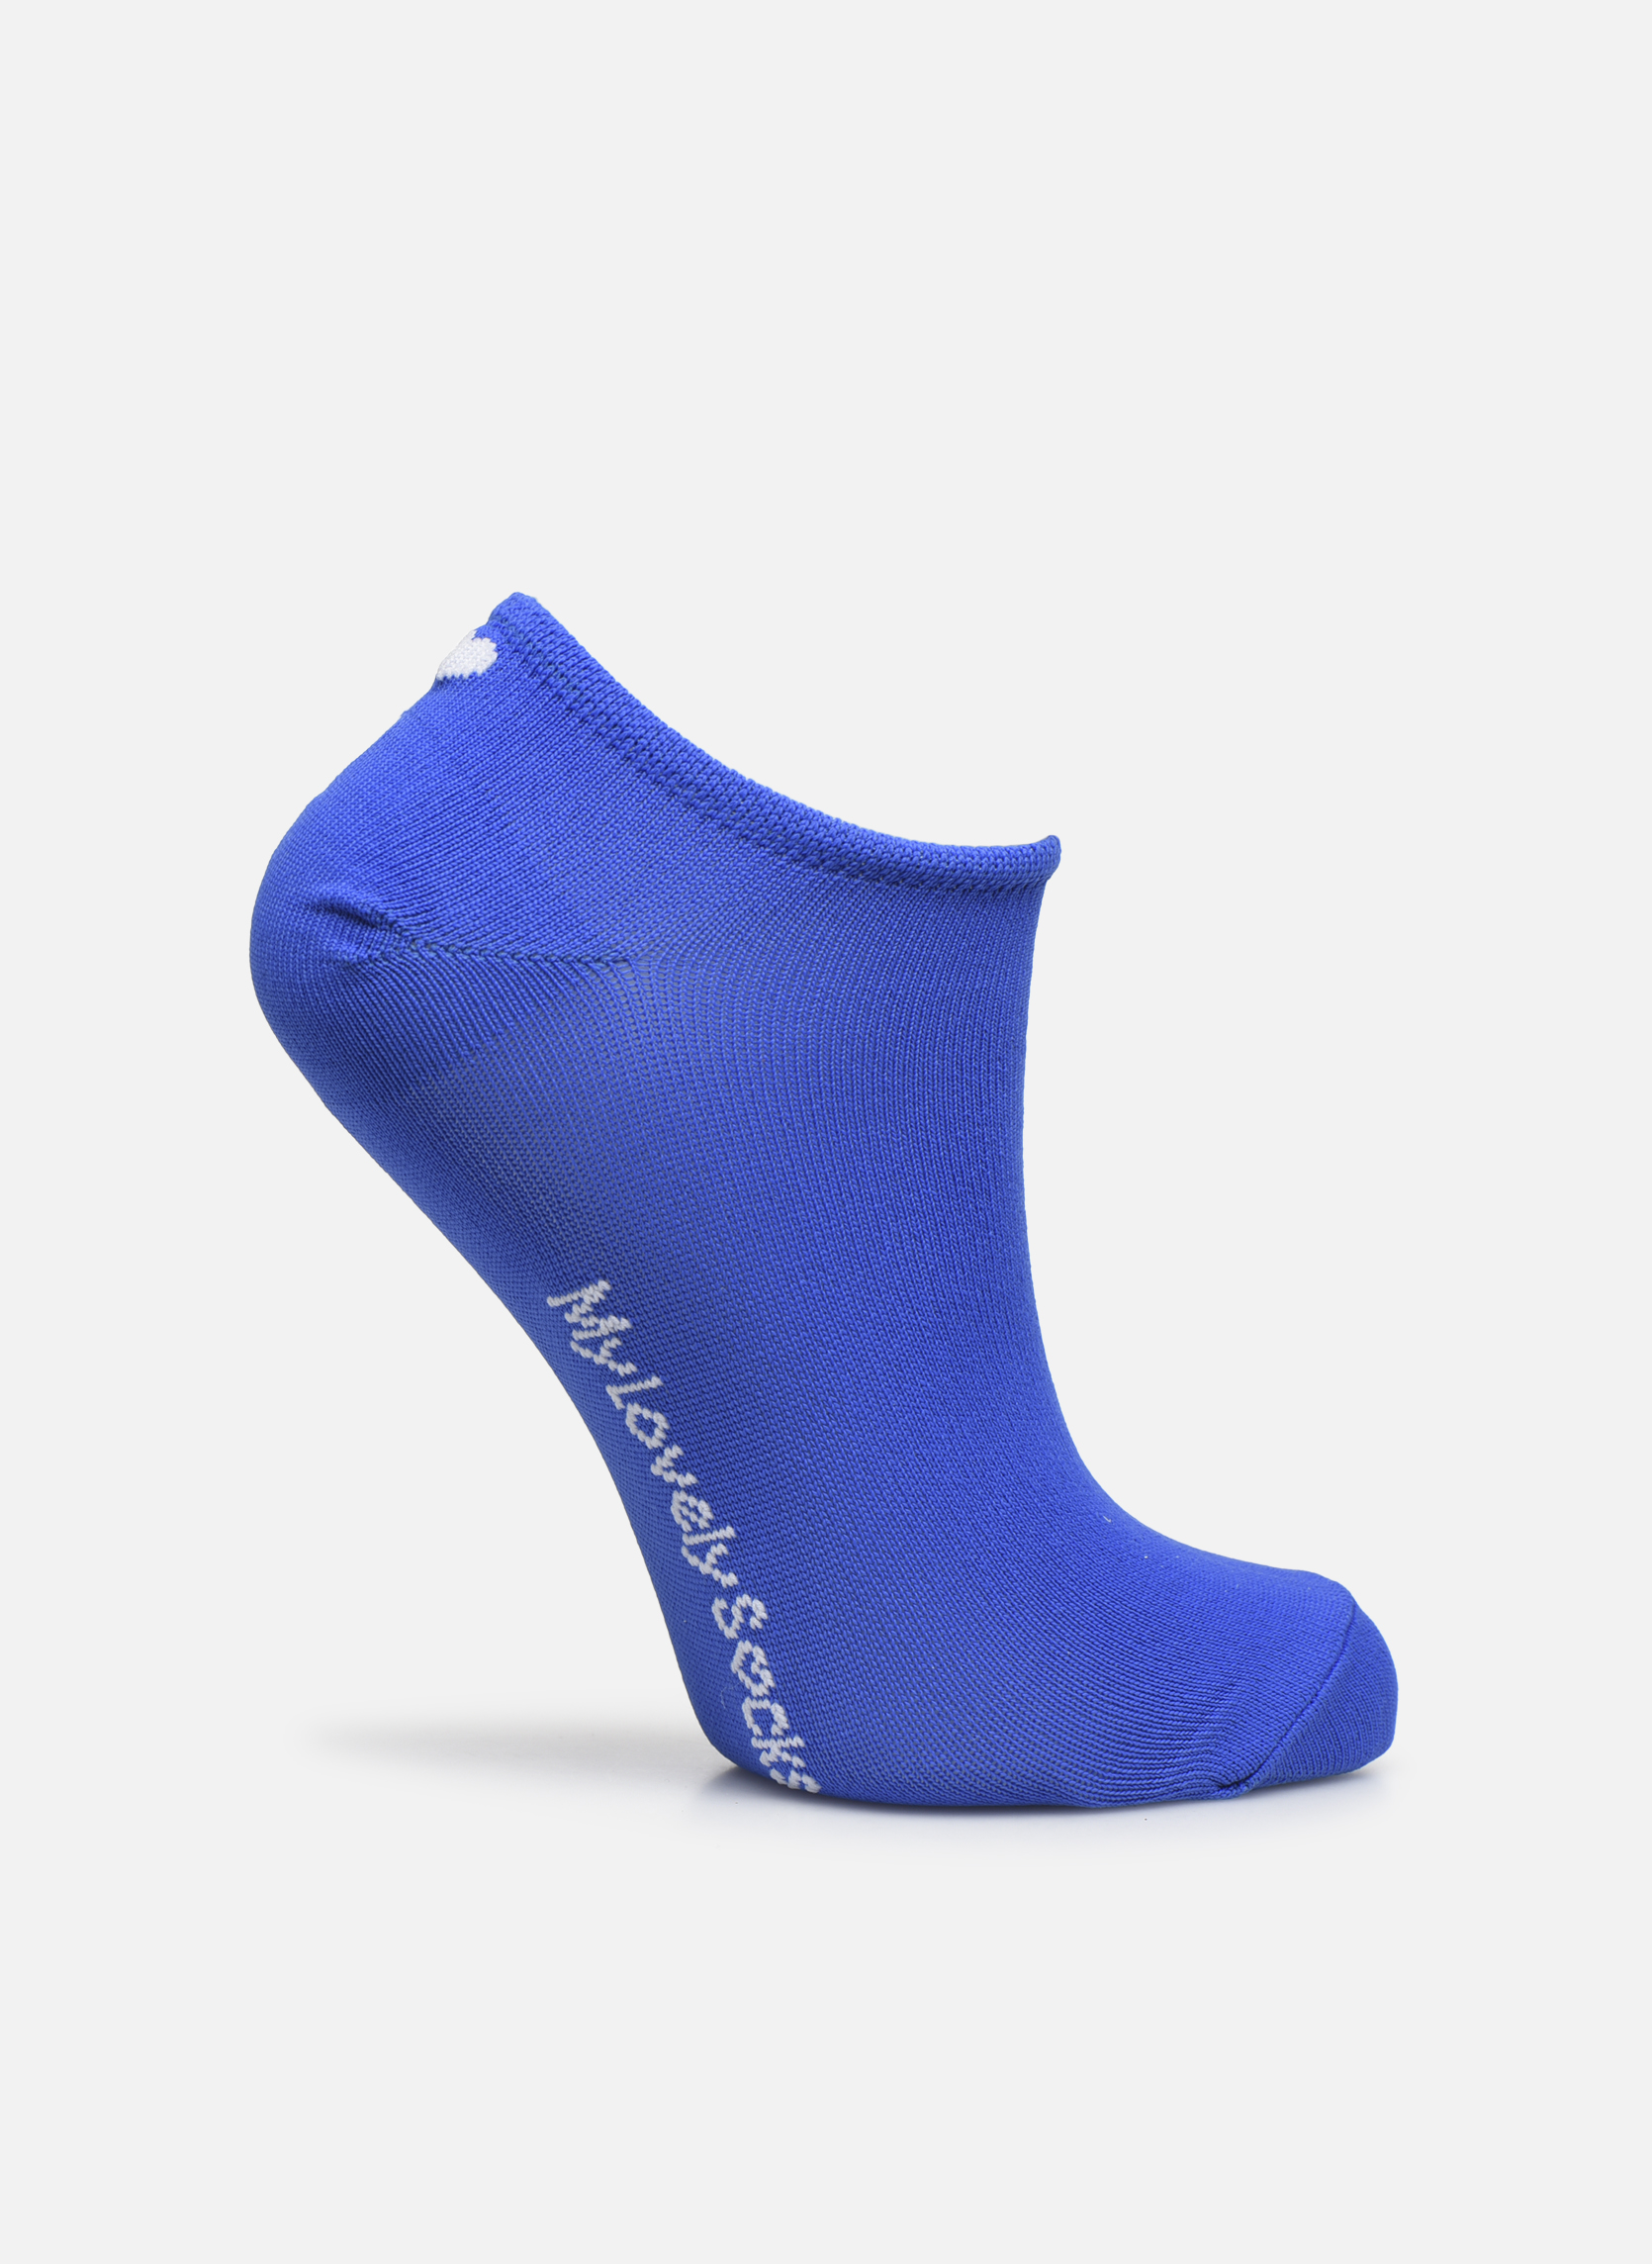 Chaussettes Invisibles Fluo SACHA Bleu Royal